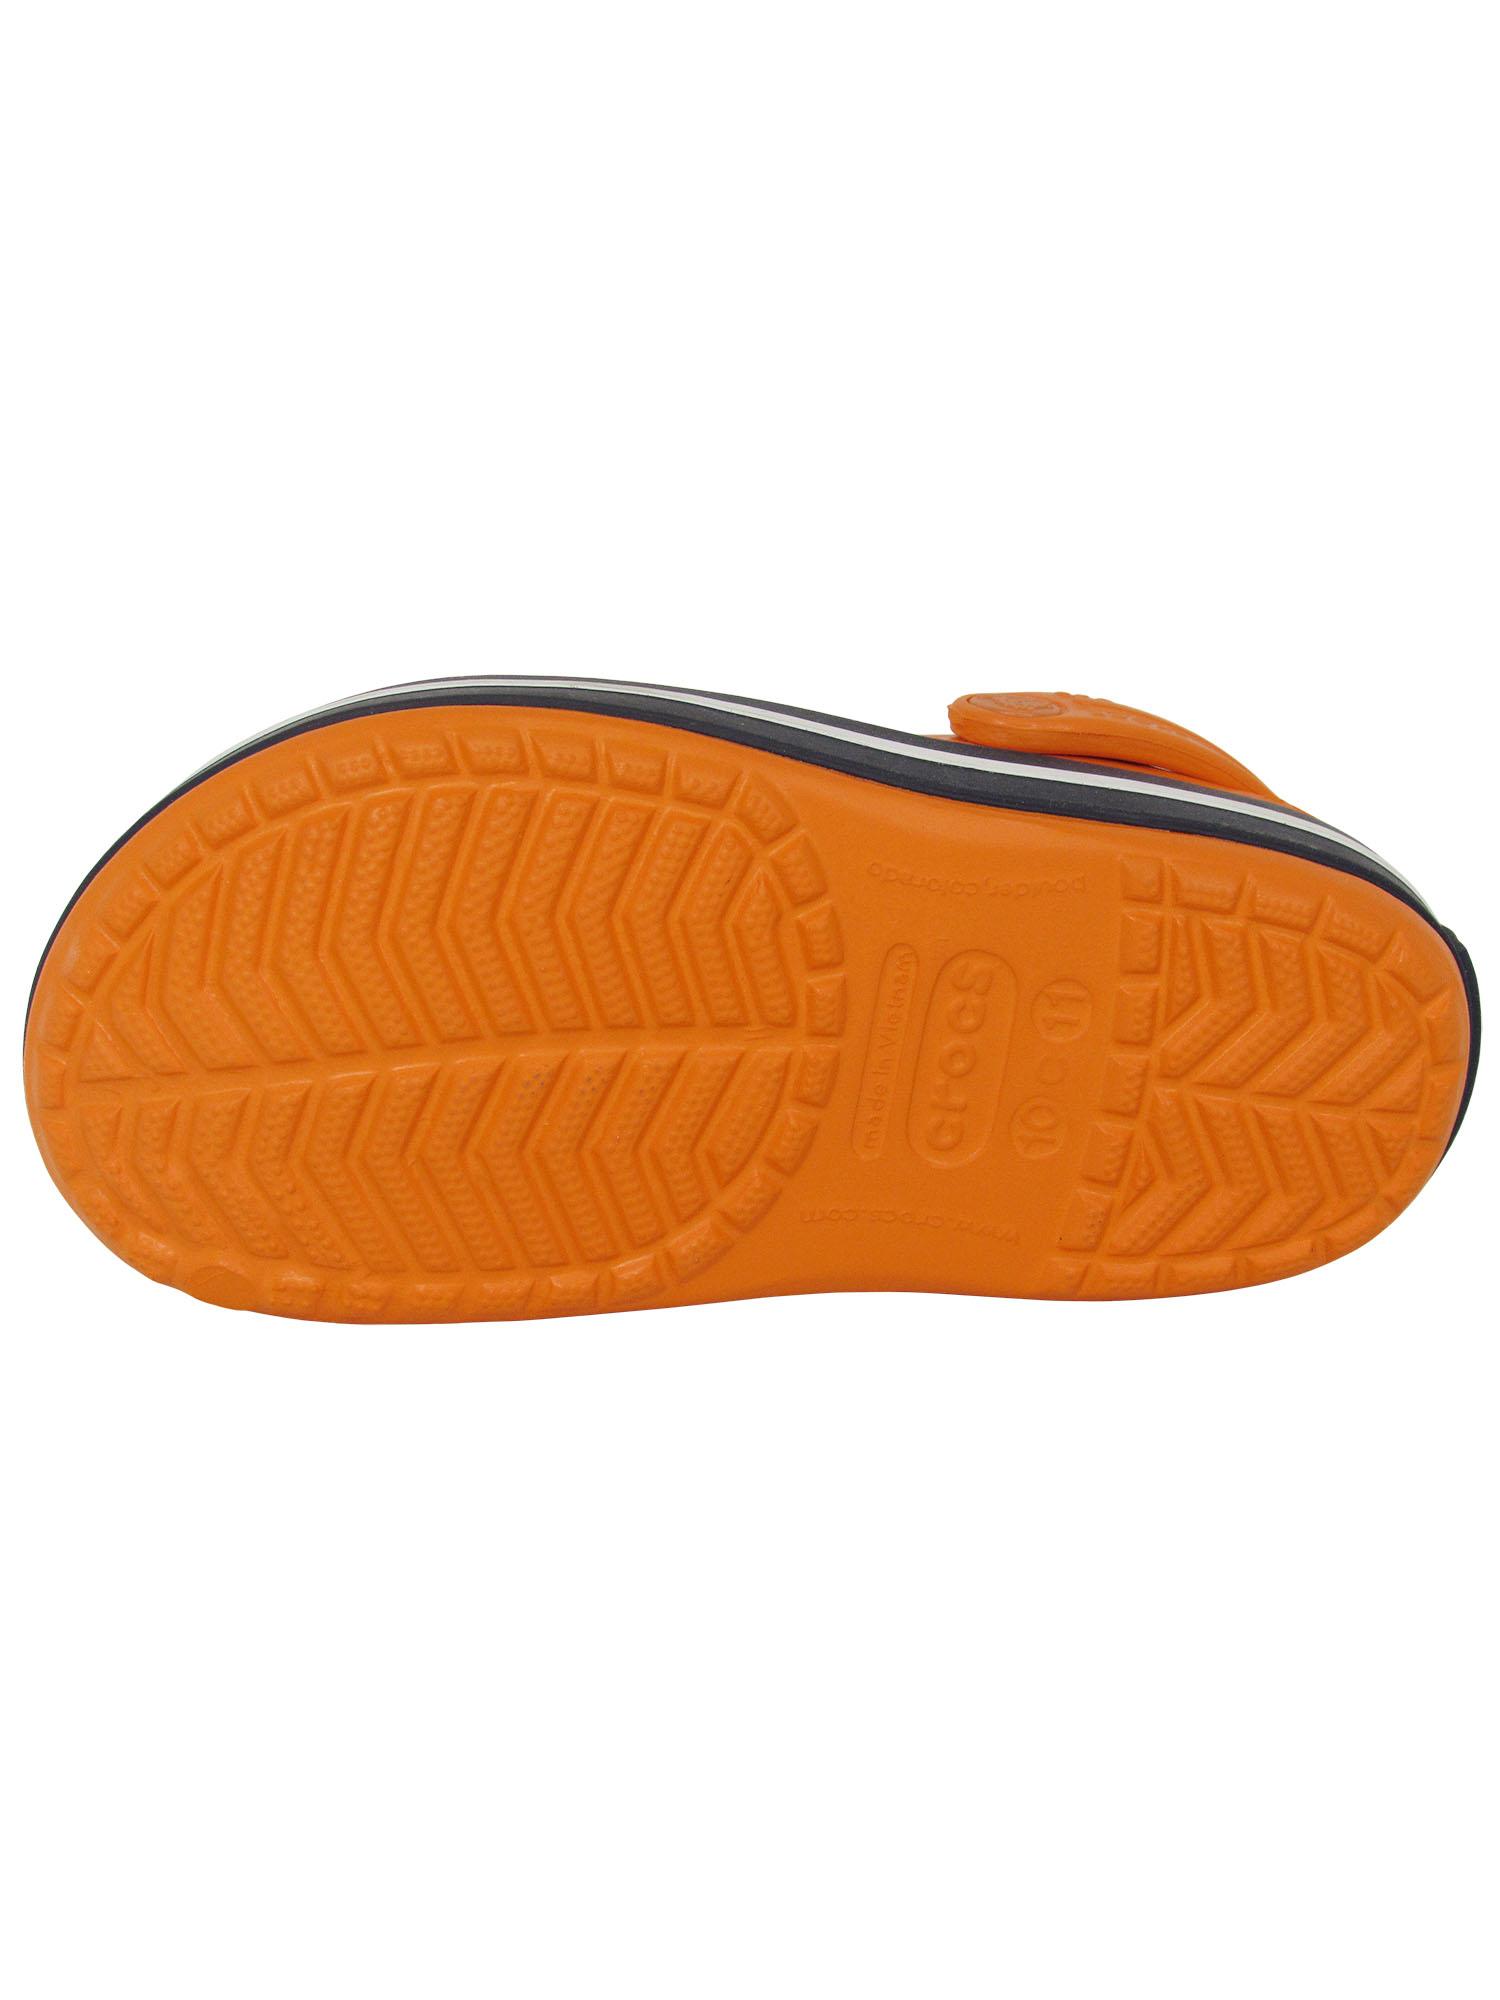 Crocs-Crocband-Kids-Slip-On-Clog-Shoes thumbnail 9